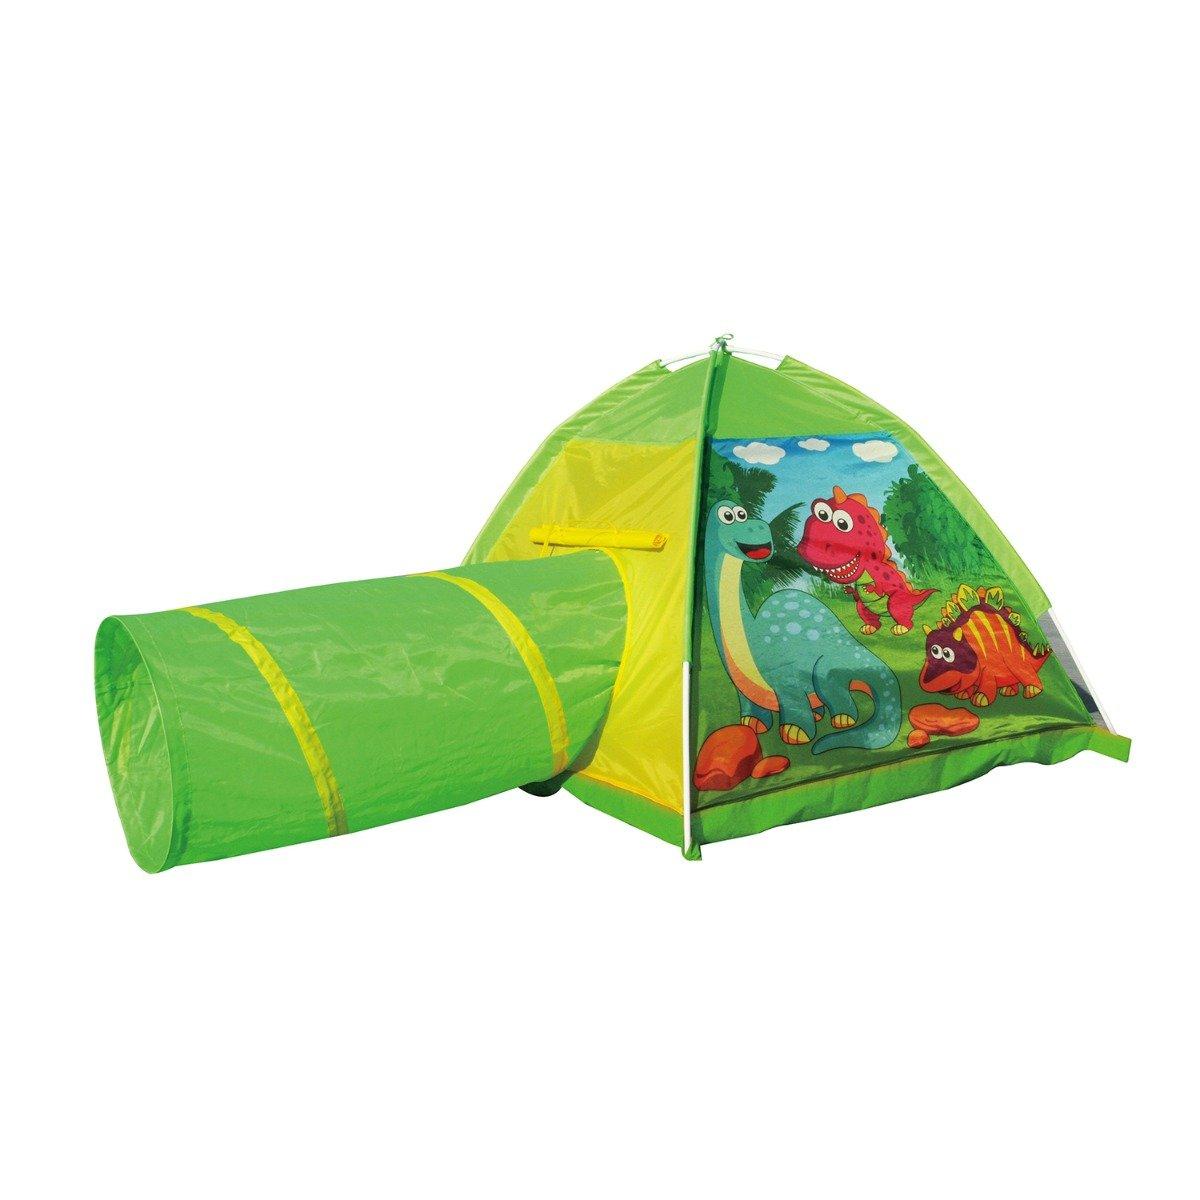 Cort cu tunel pentru copii Iplay-Toys Dinosaur Tent